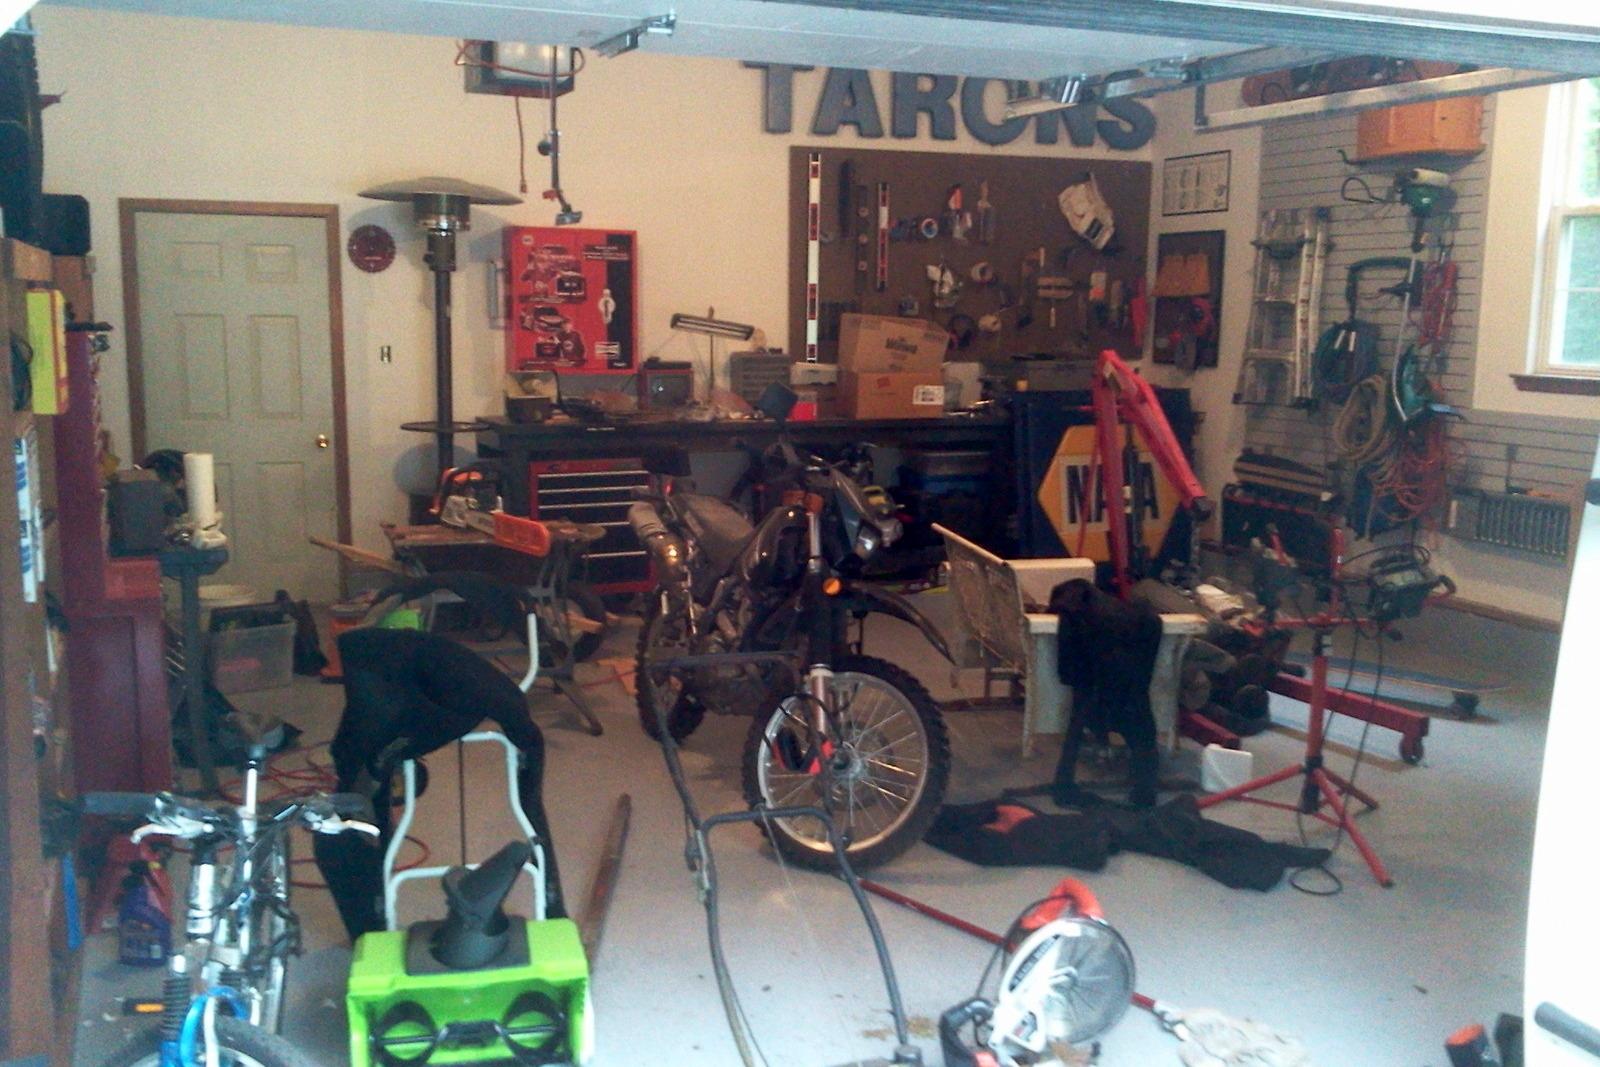 NAPA Garage Intervention Photo Contest on Facebook